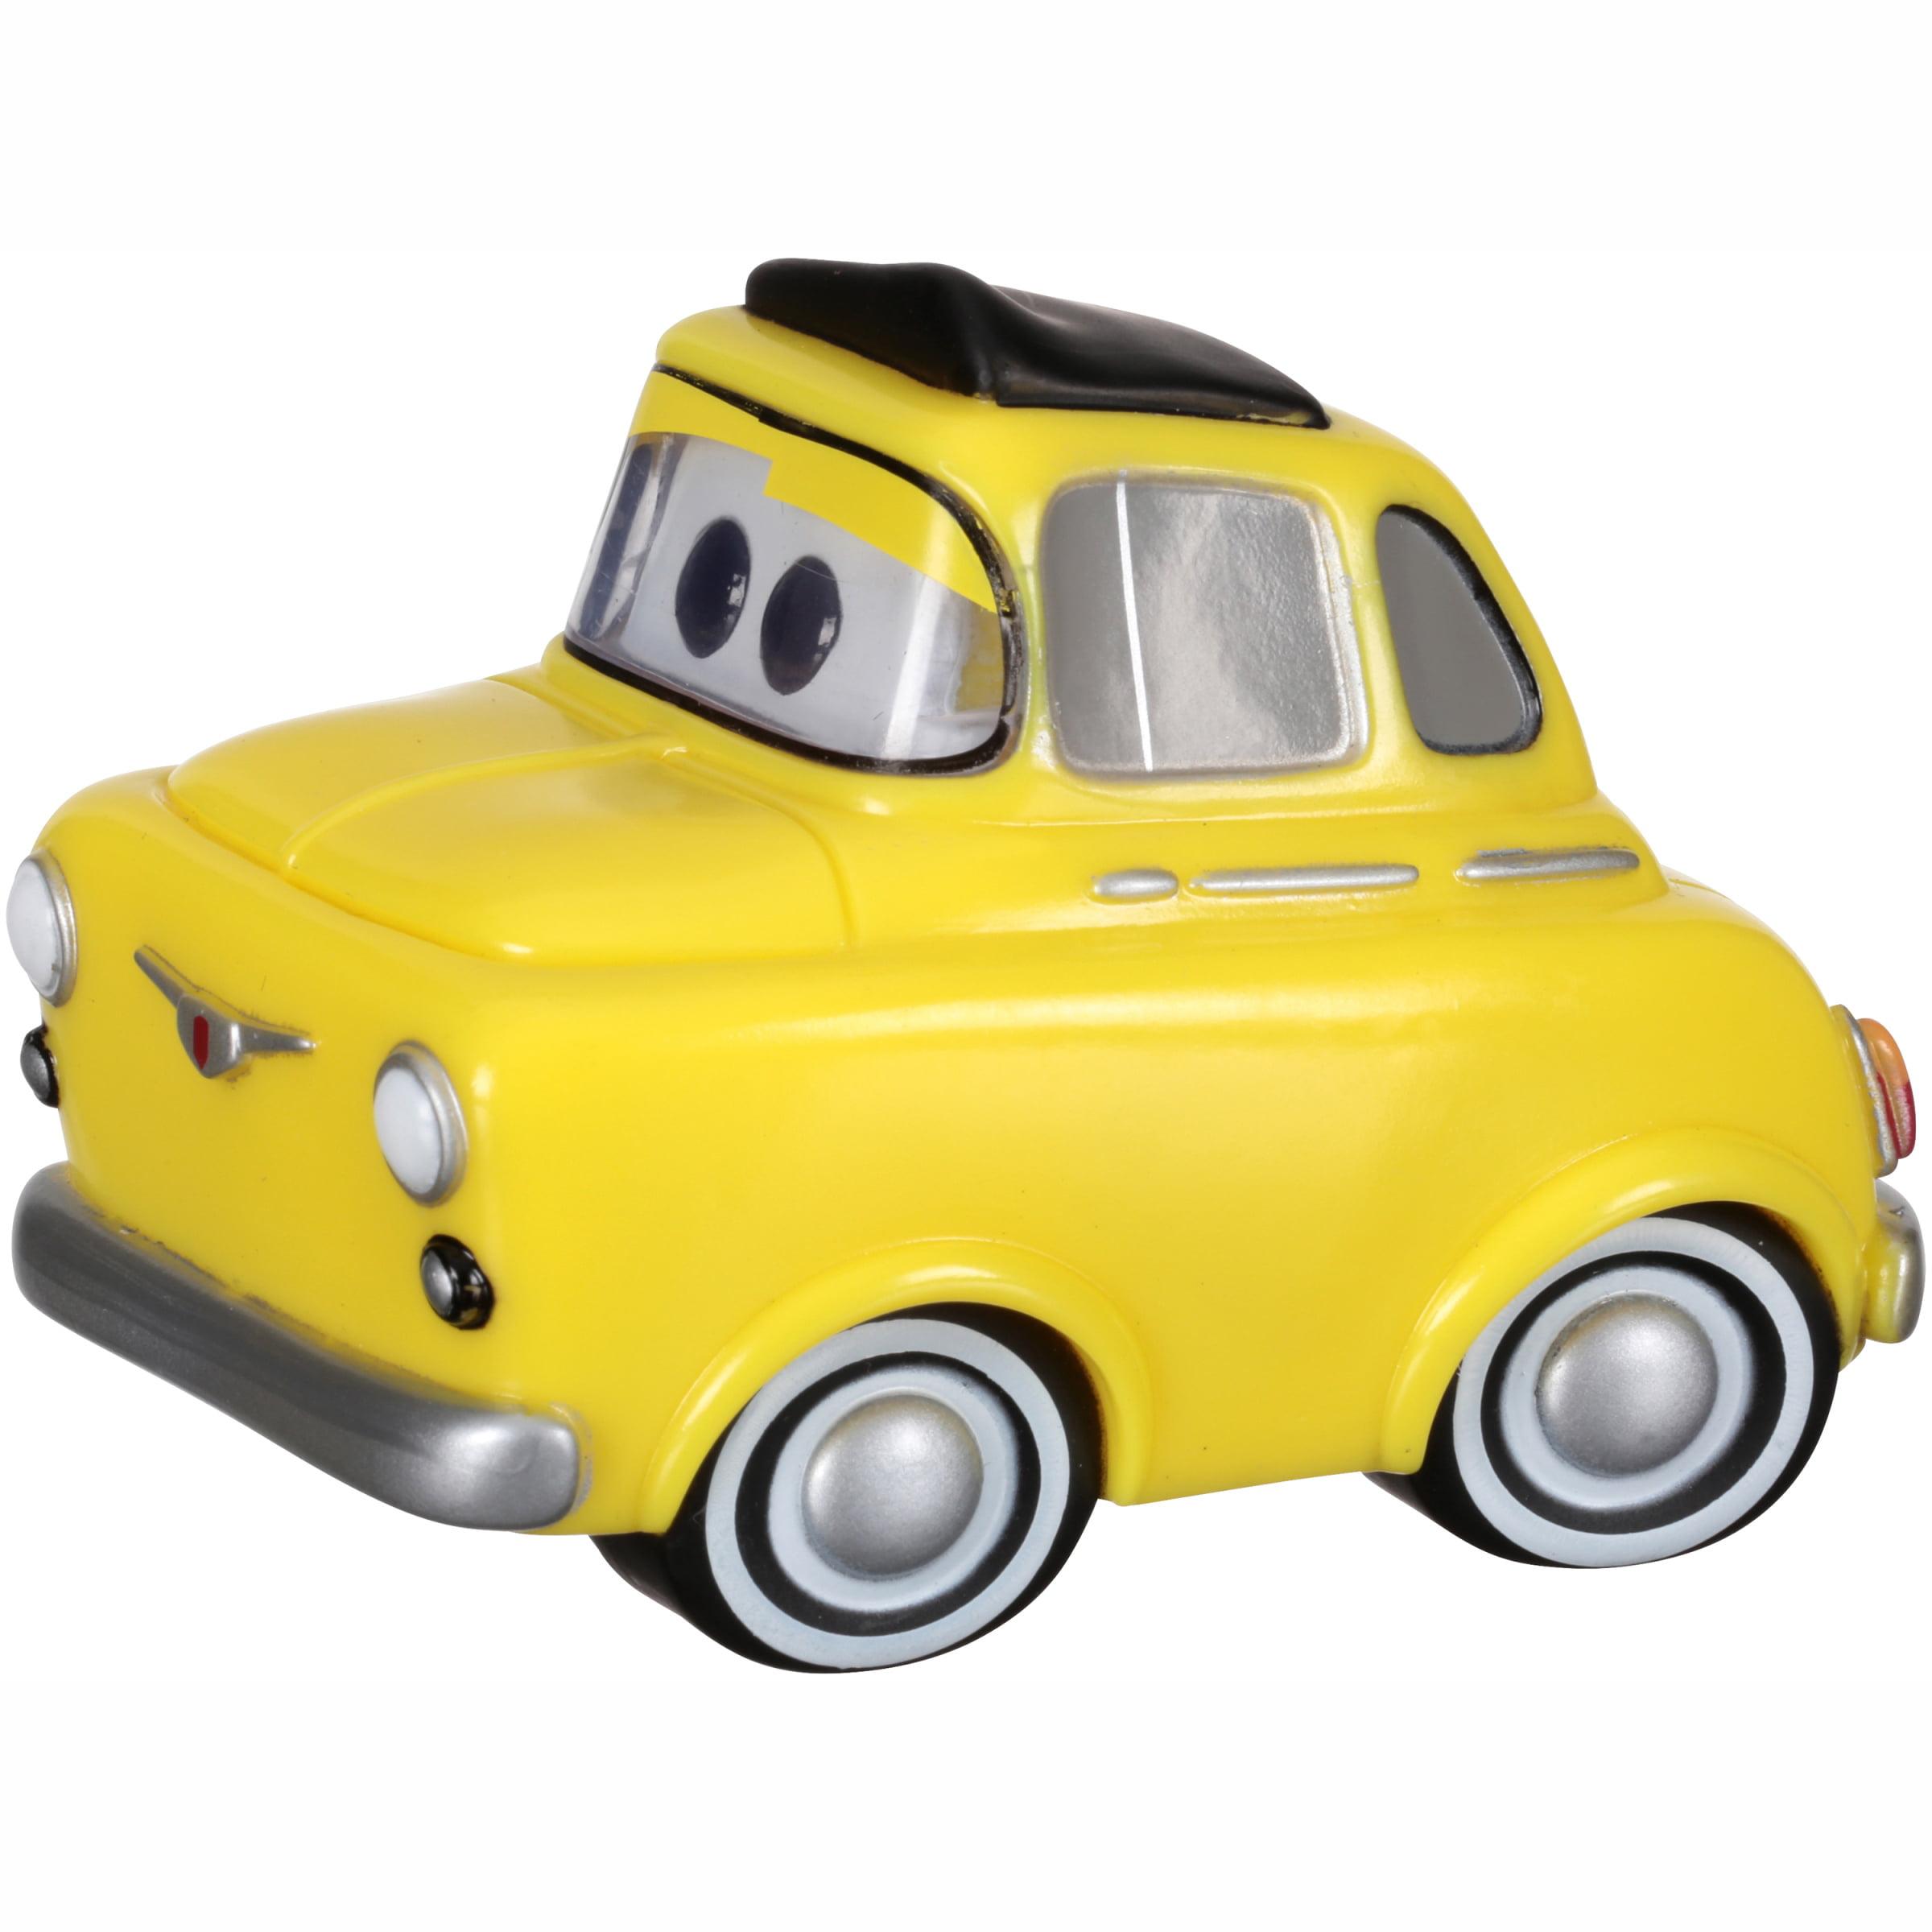 Funko POP! Disney Pixar Cars Luigi Vinyl Figurine by Funko